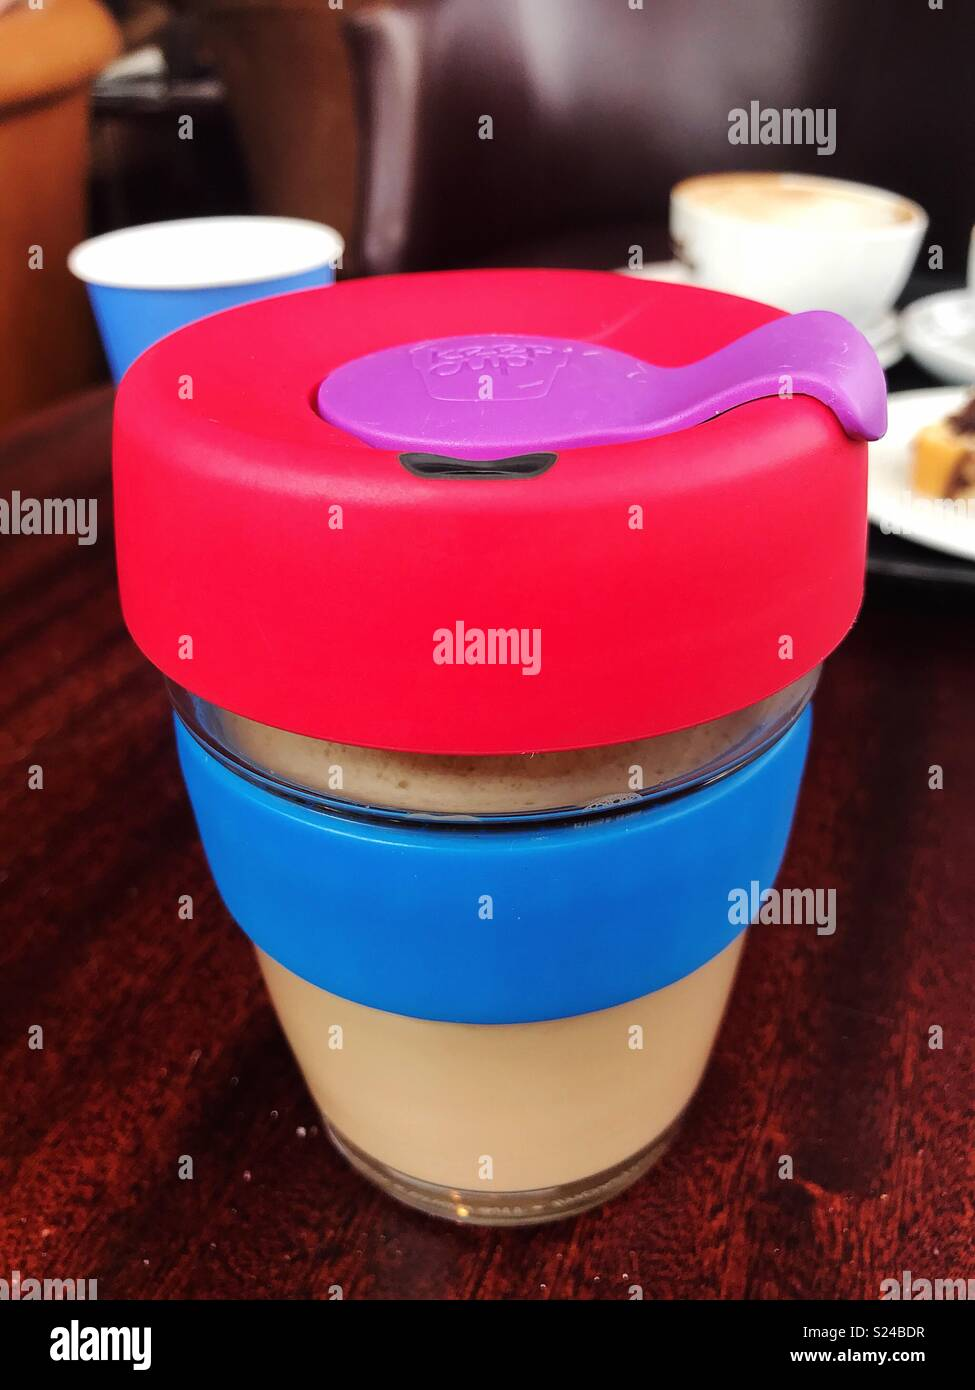 Reusable Coffee Cup - Stock Image